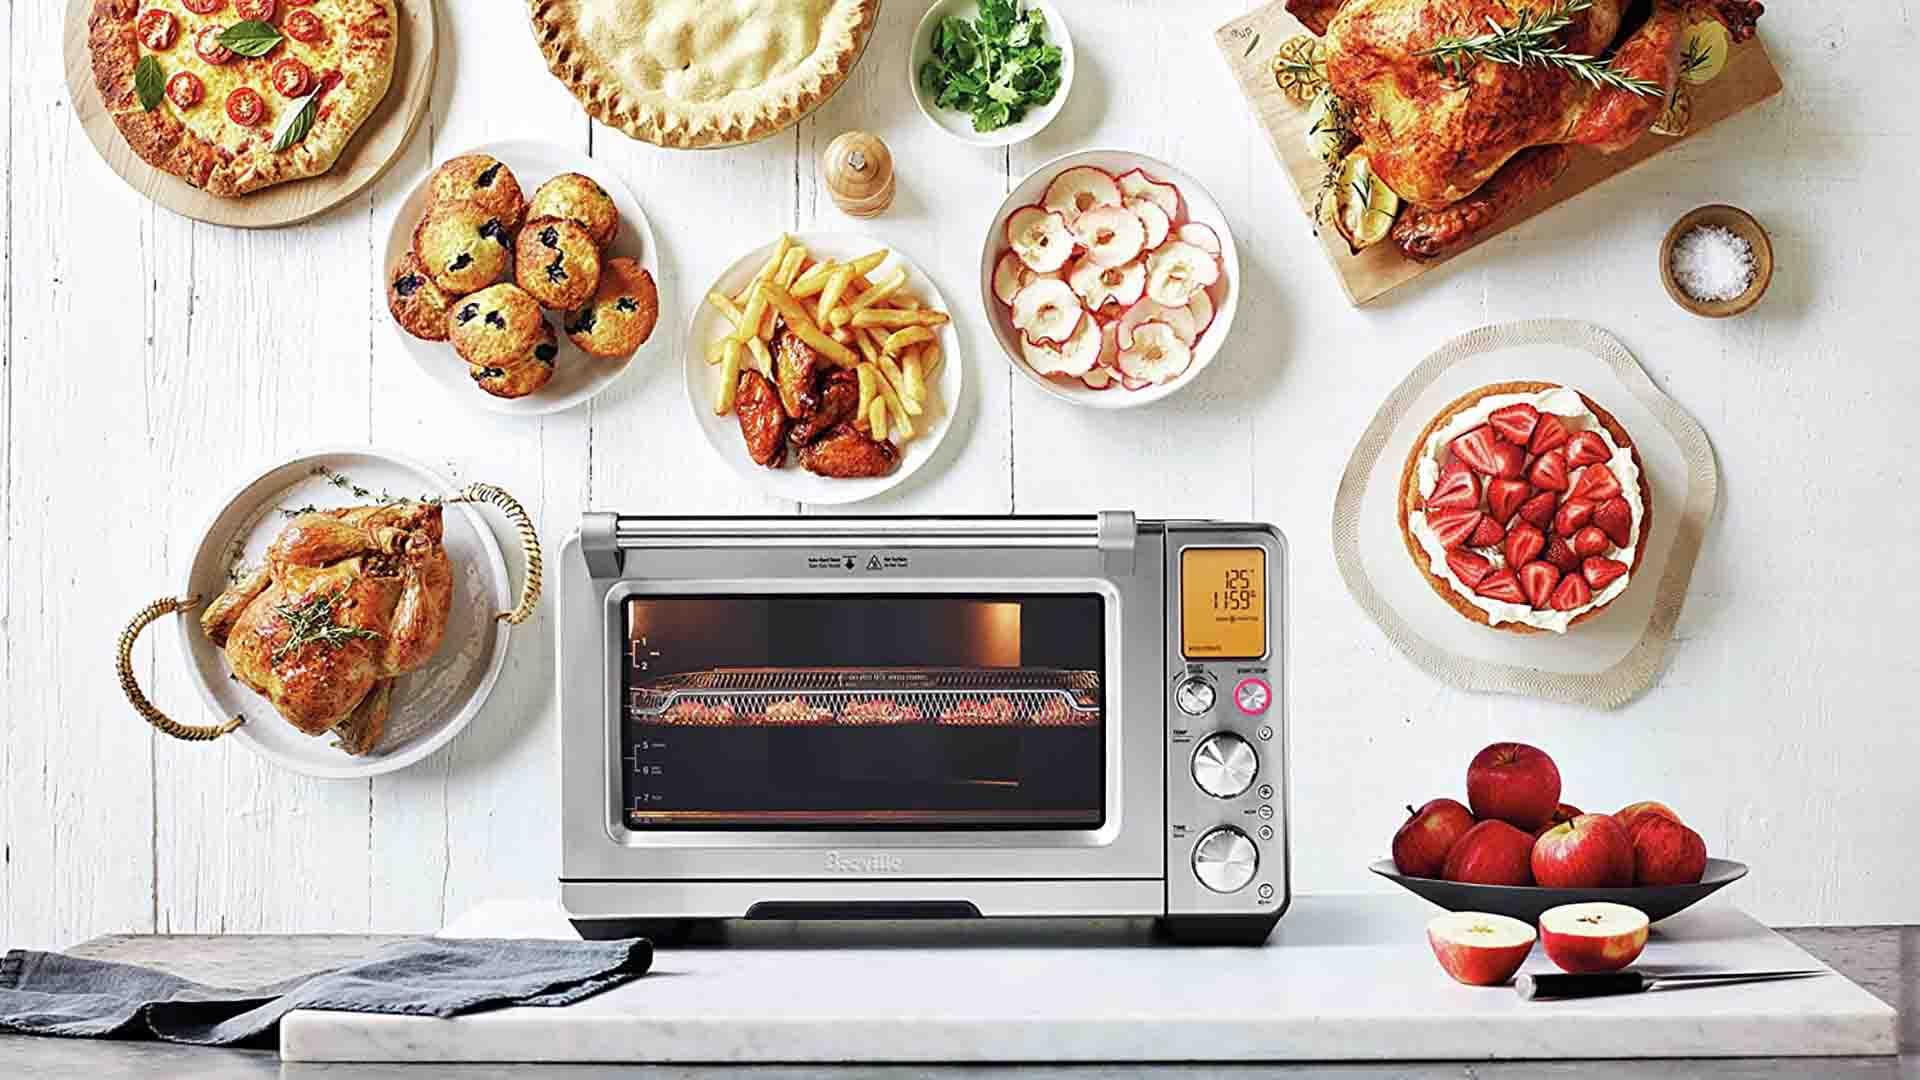 Breville Smart Oven Air Fryer Pro (BOV900BSS)